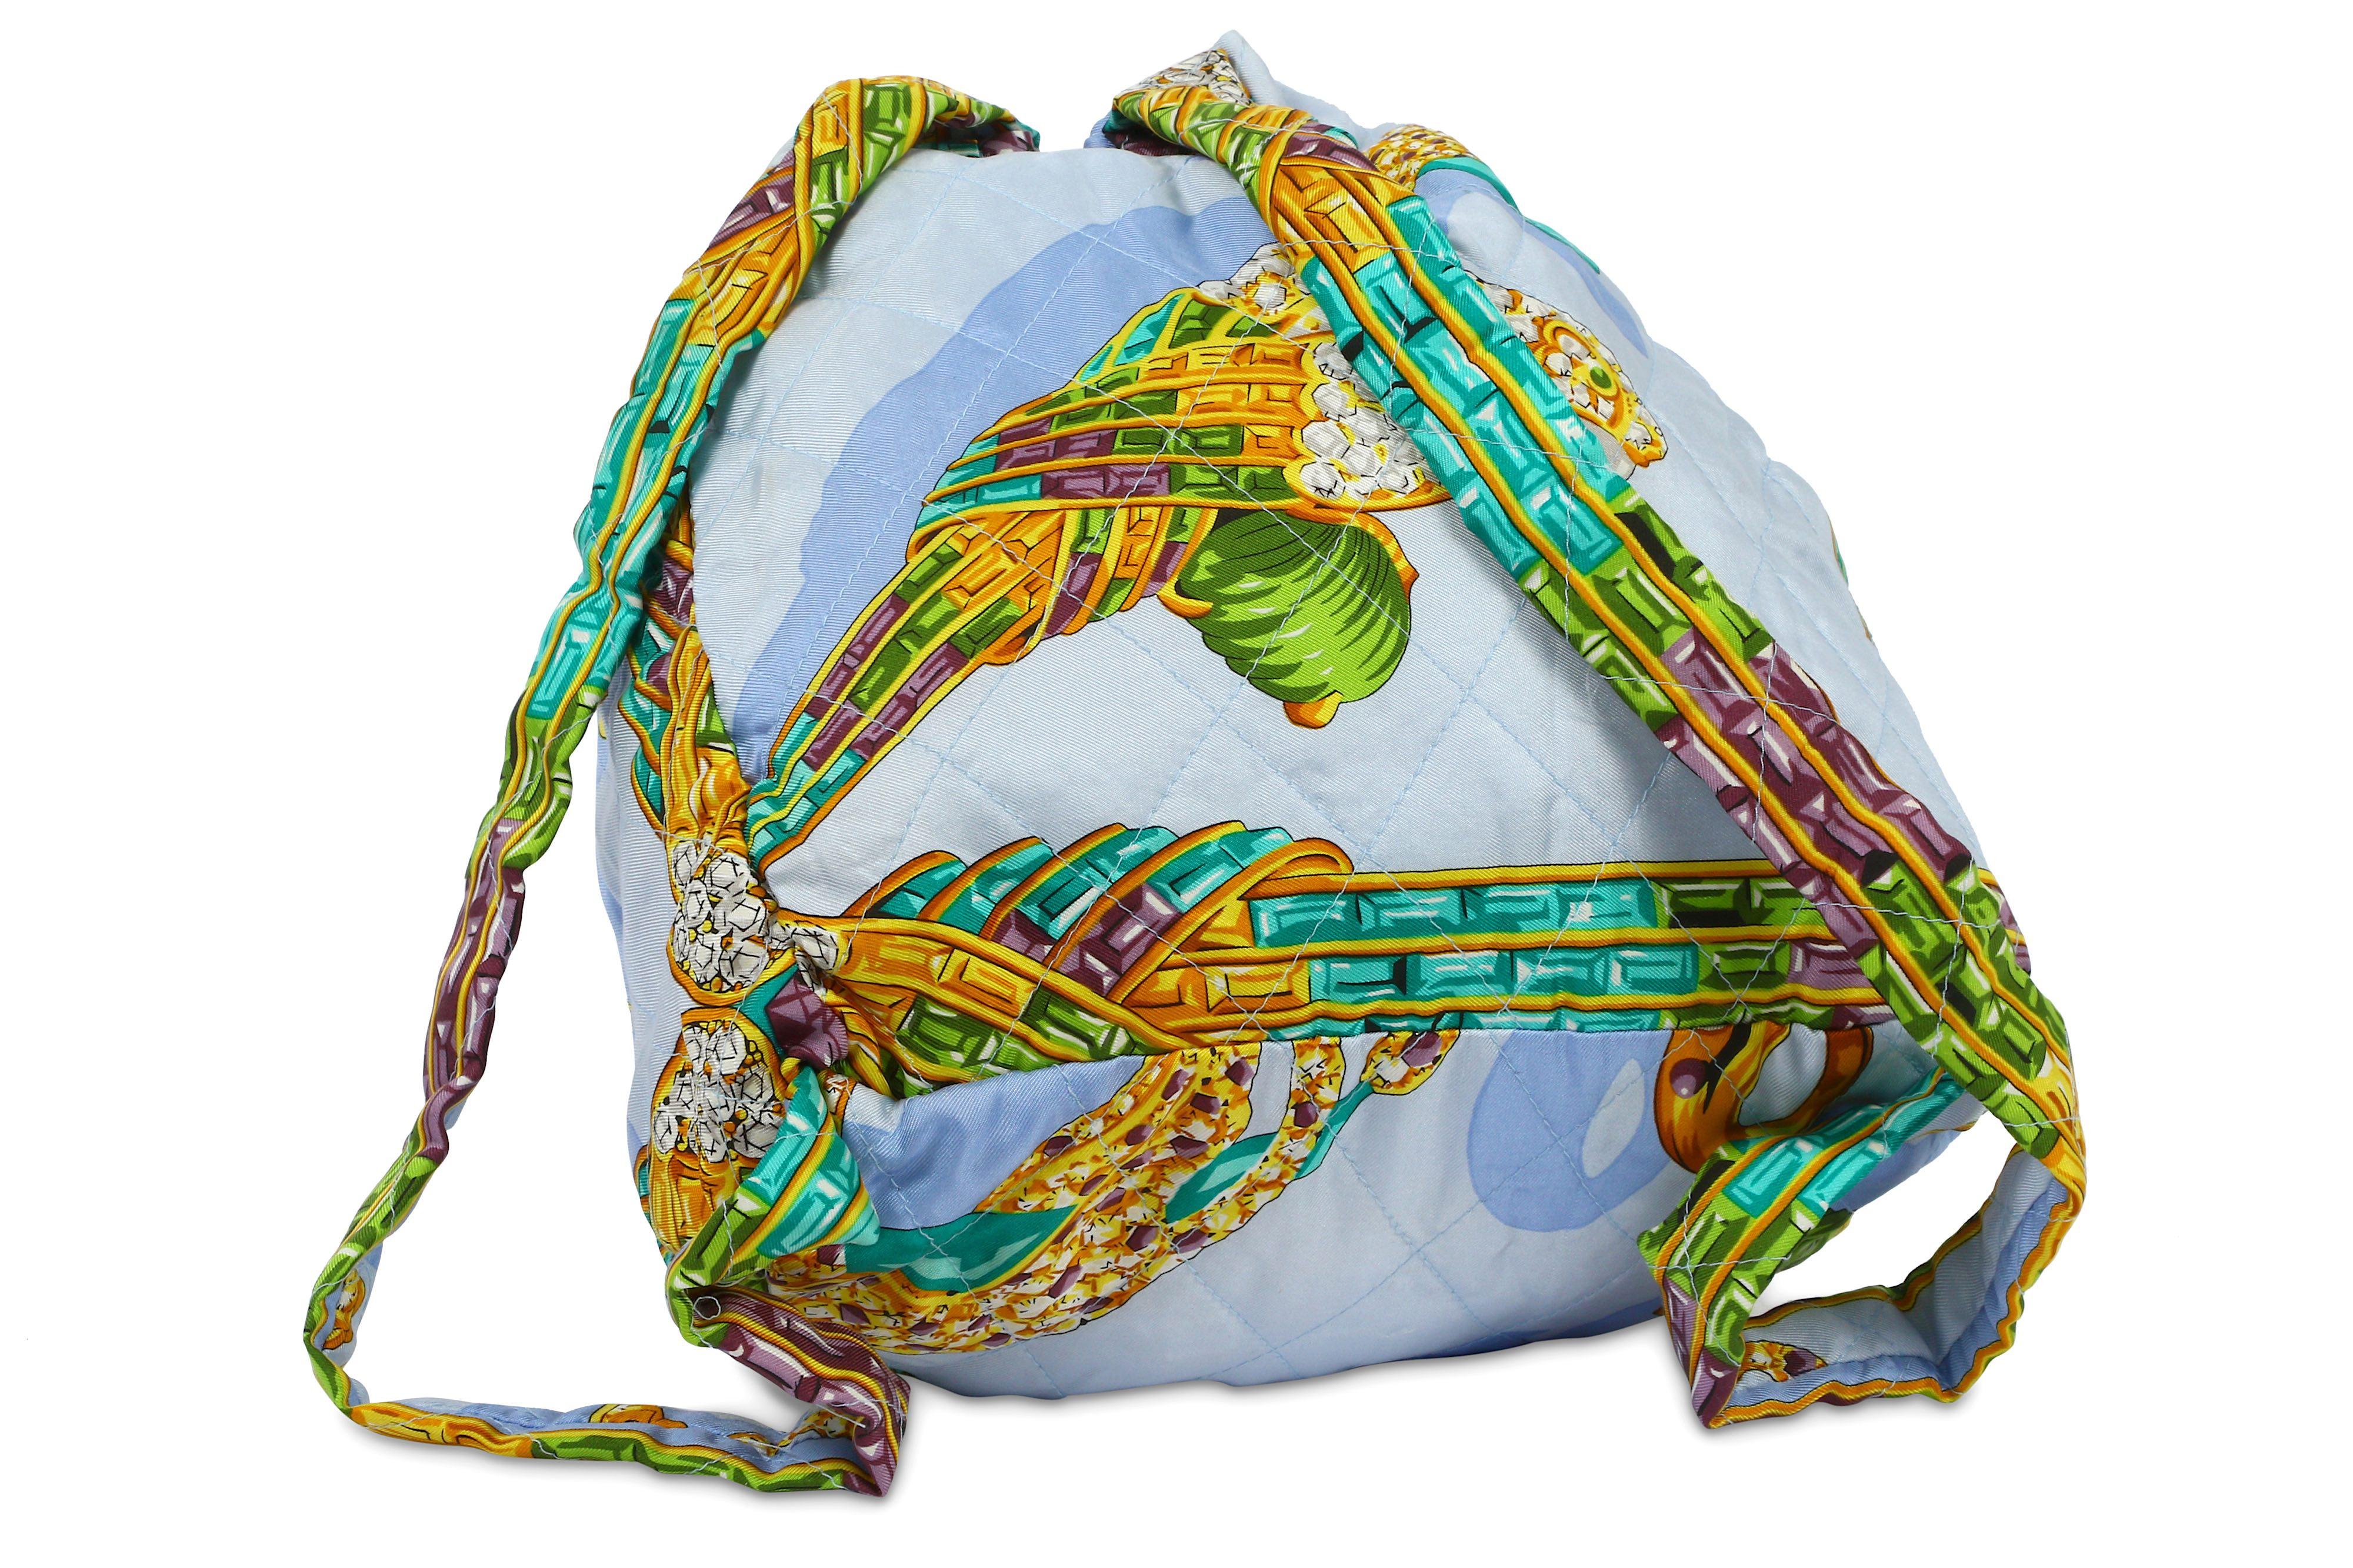 Lot 75 - Must de Cartier Silk Backpack